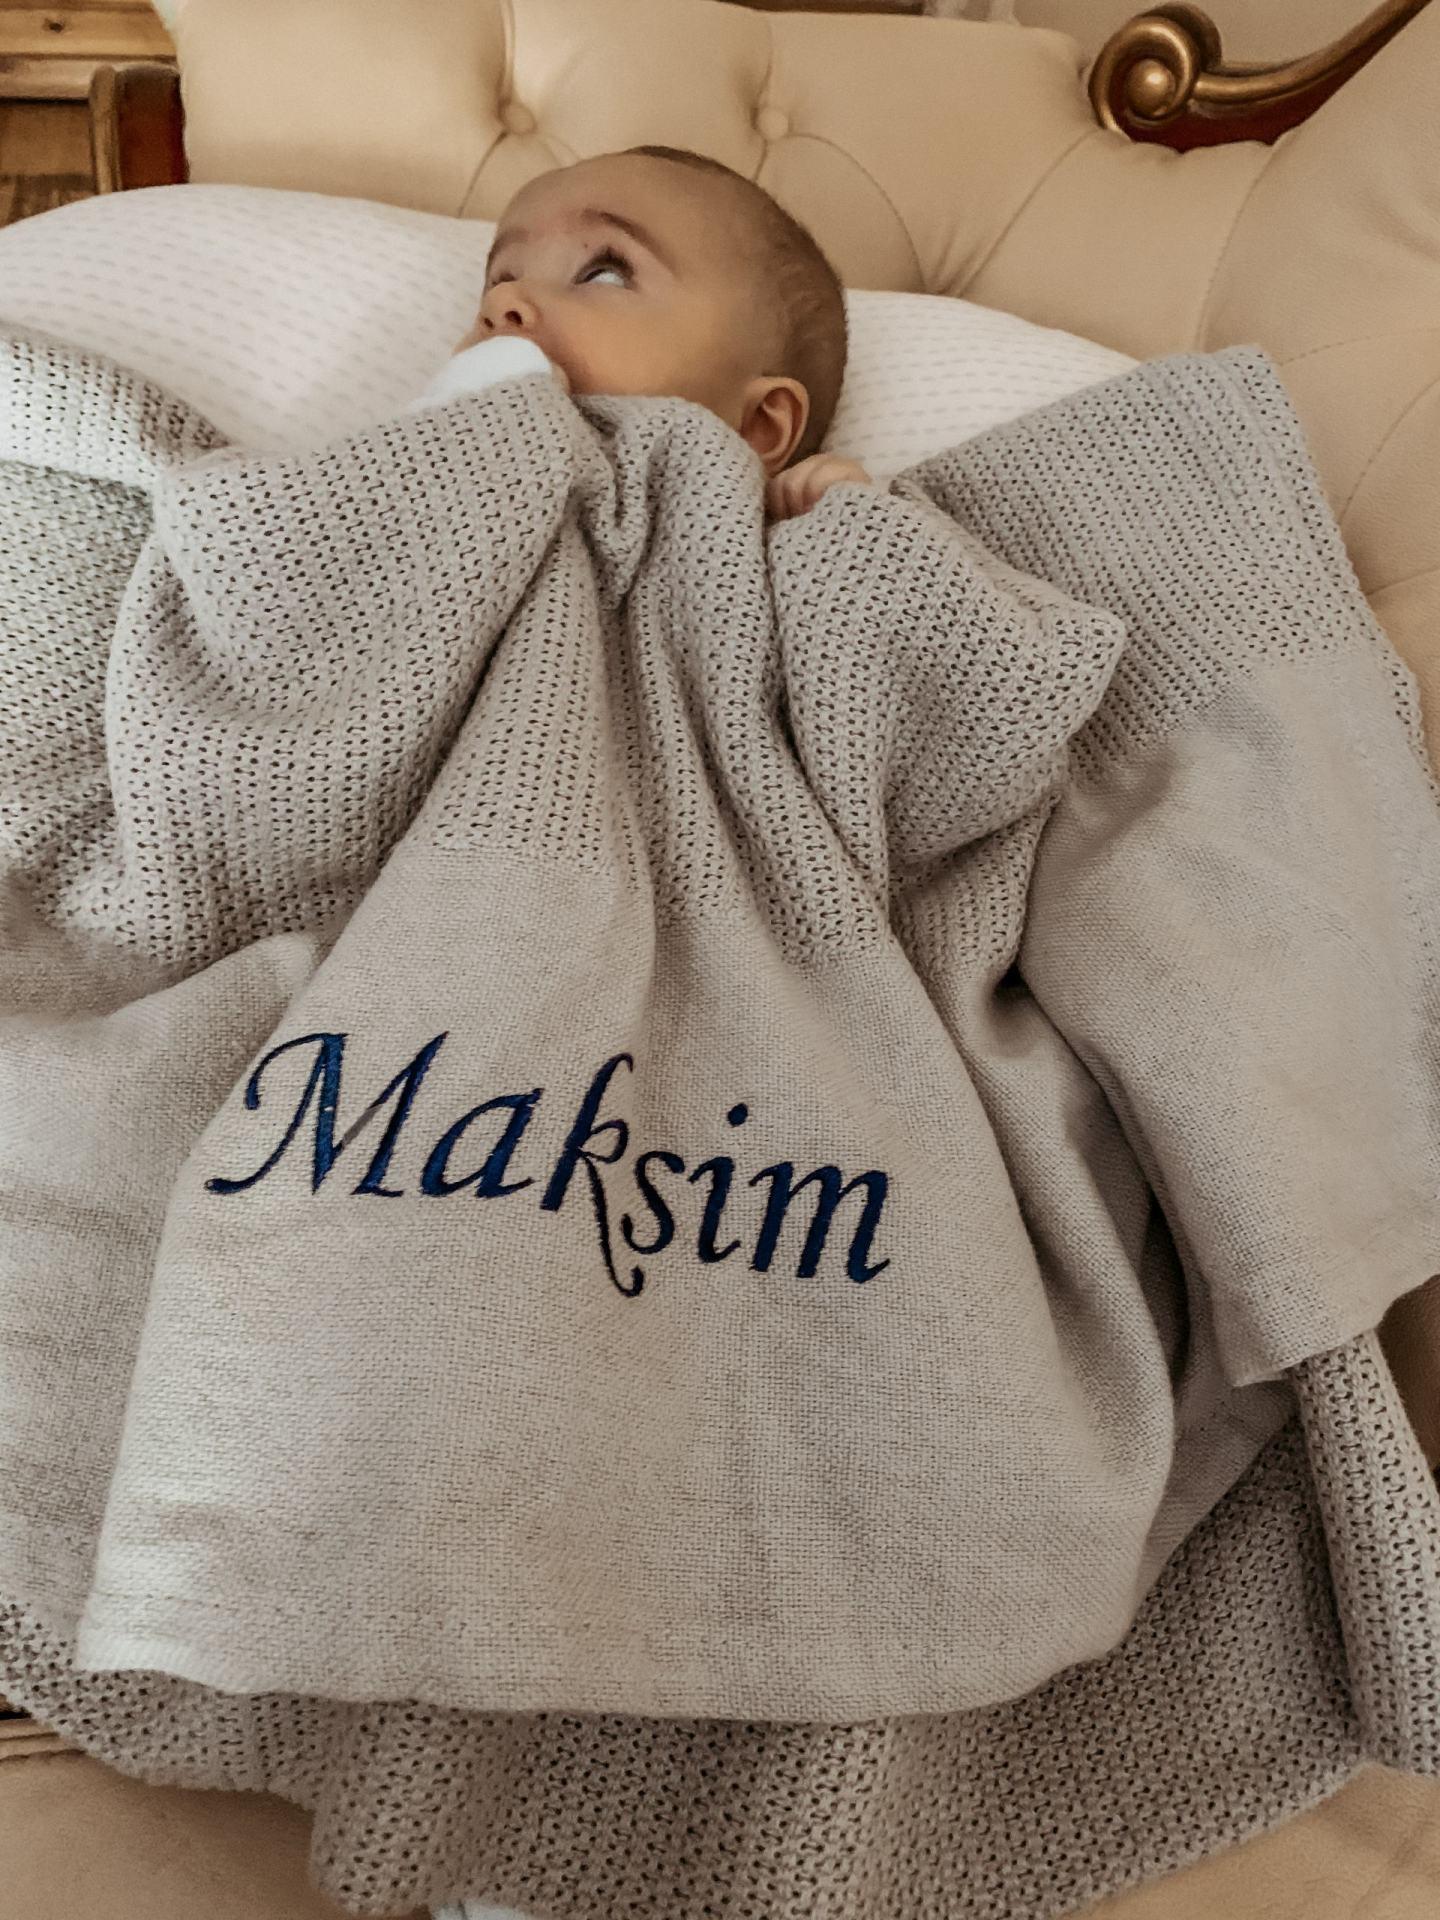 personalised-blanket-www.stylinglifetoday.com